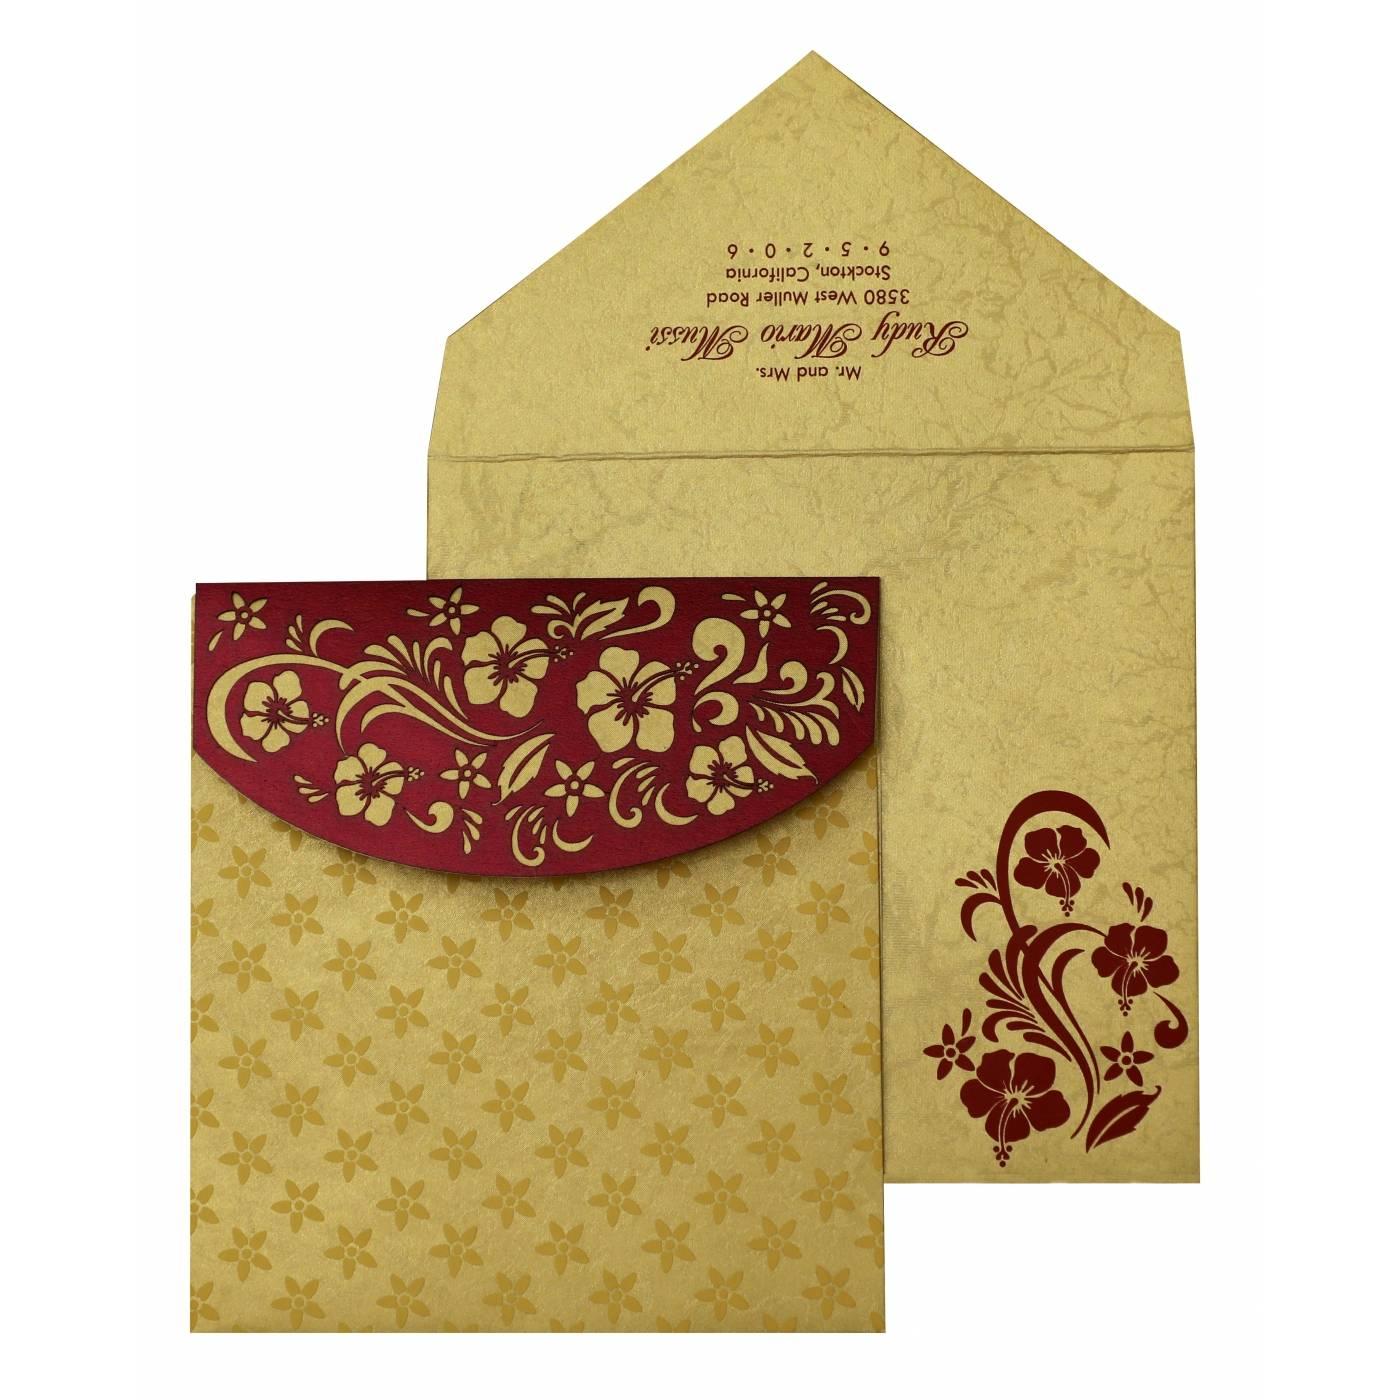 WINE RED SHIMMERY FLORAL THEMED - LASER CUT WEDDING INVITATION : G-828 - 123WeddingCards